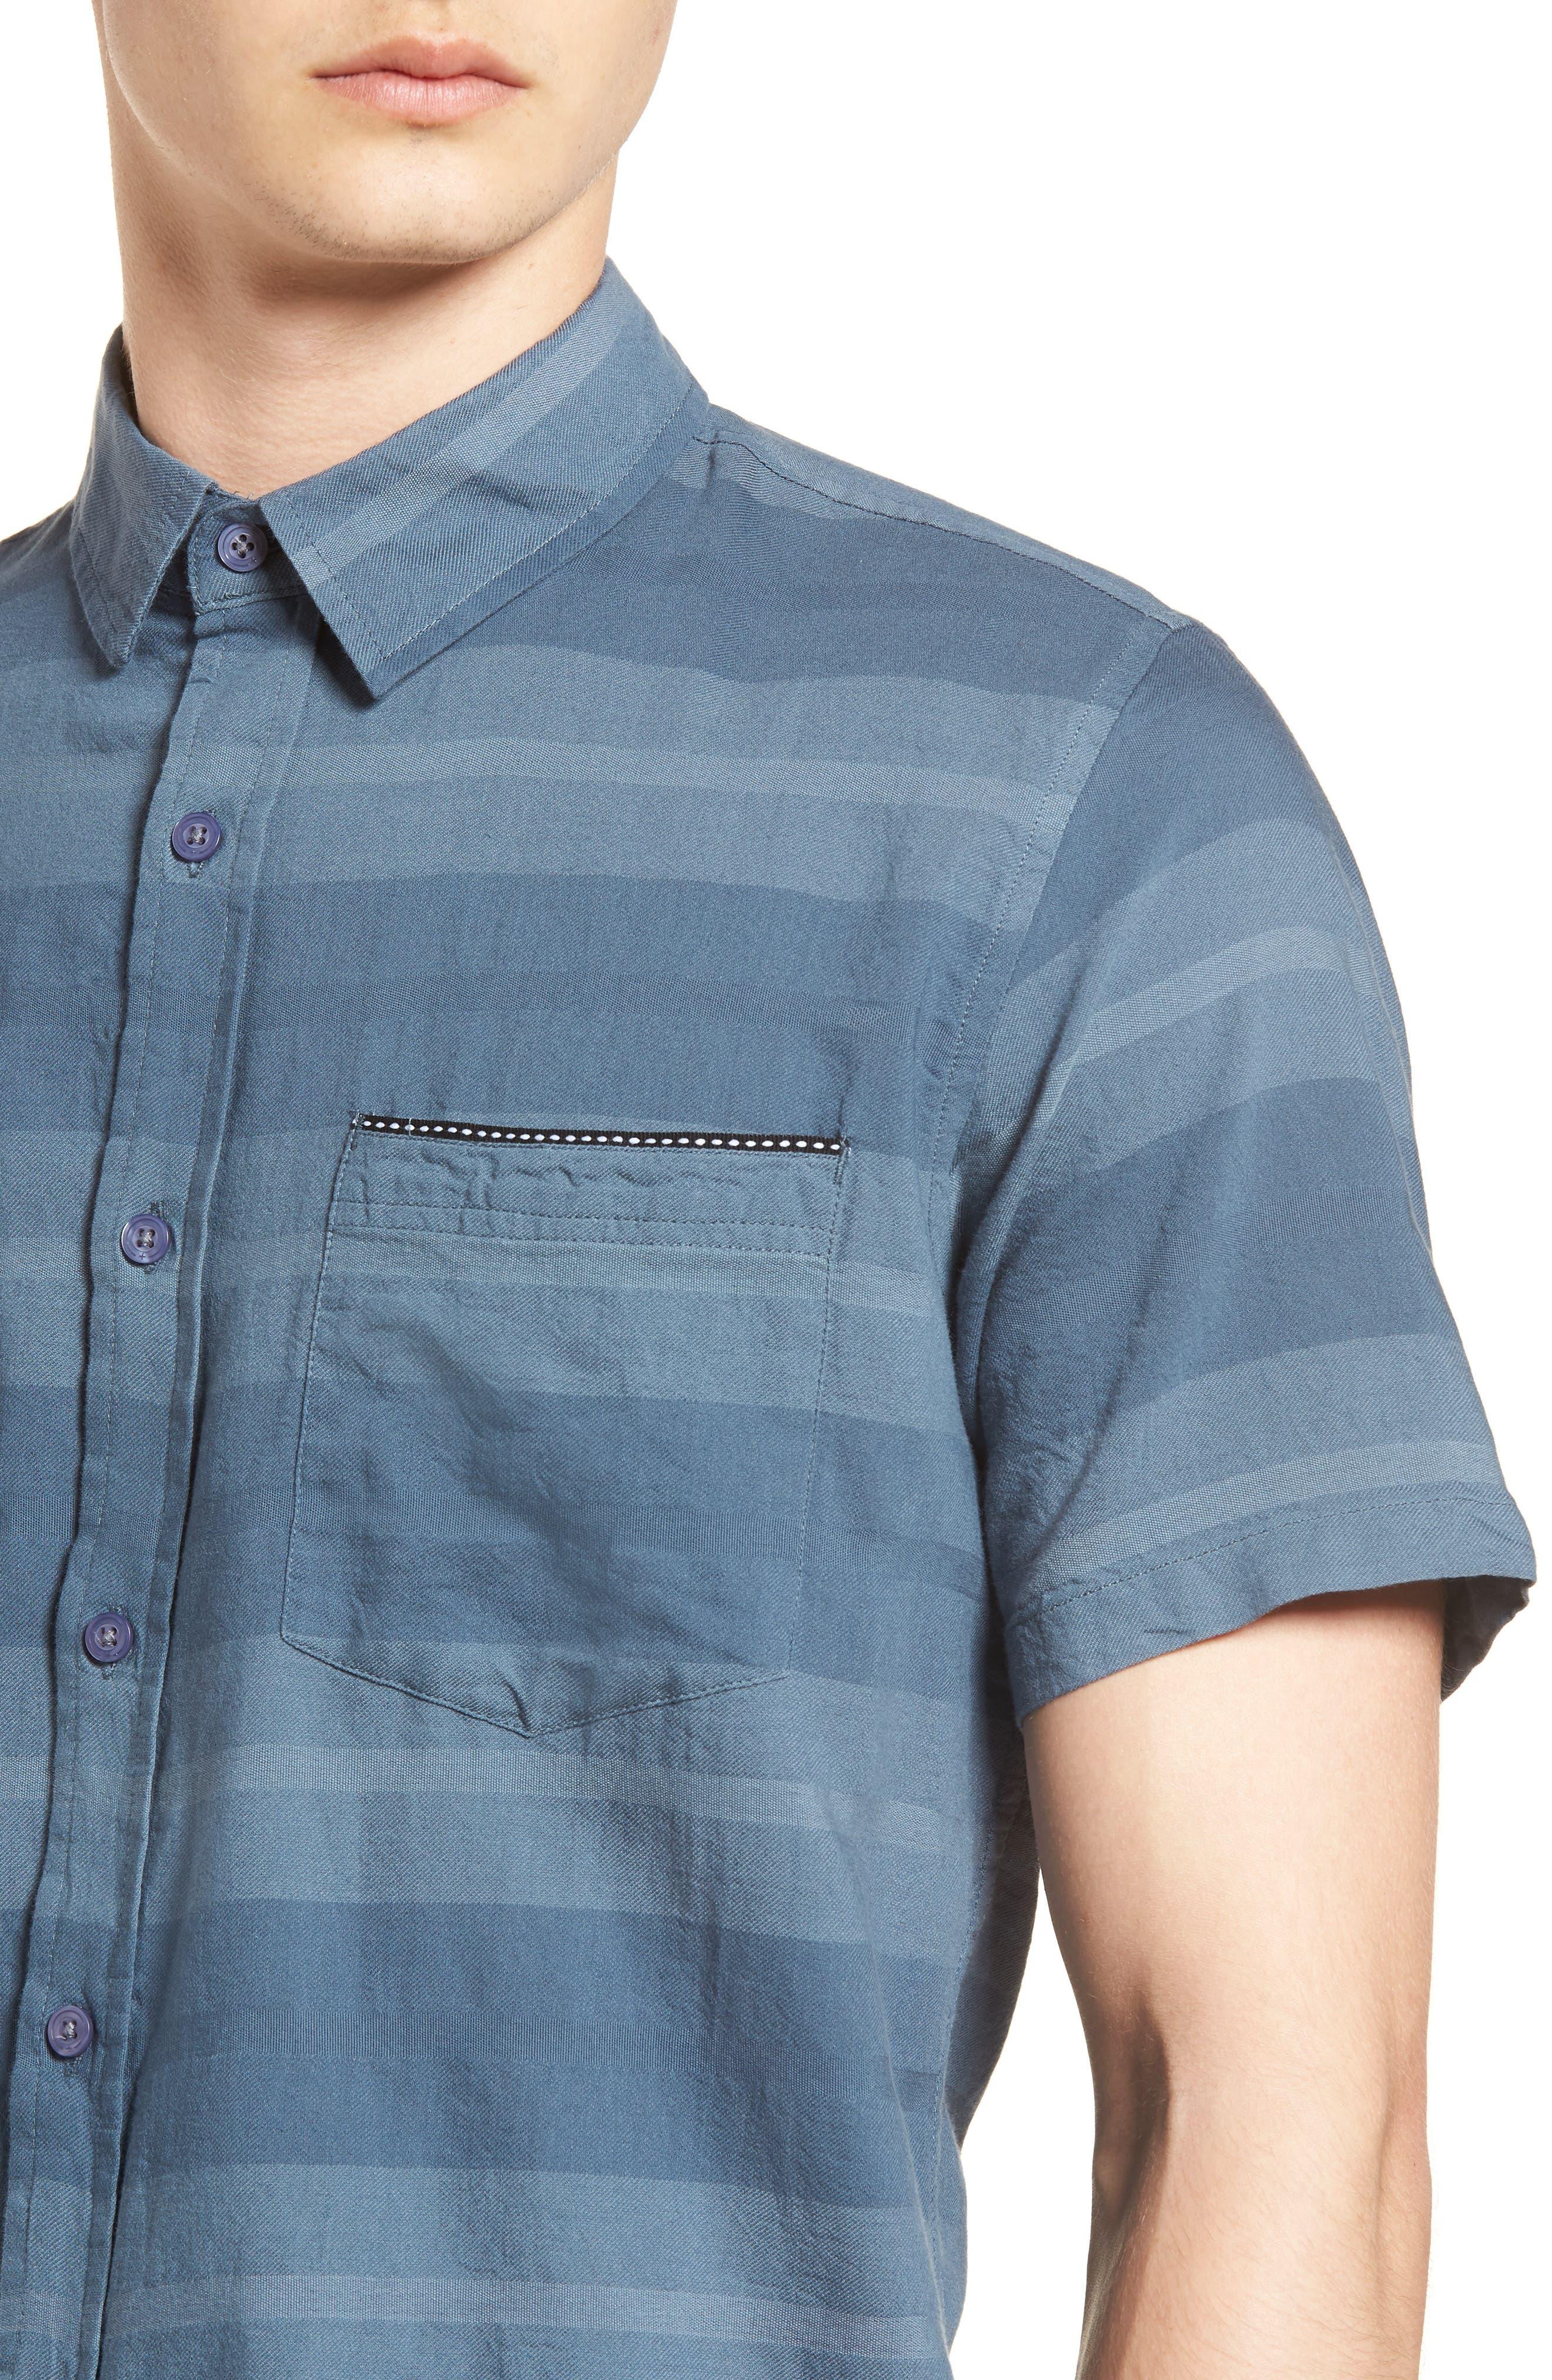 Dobson Woven Shirt,                             Alternate thumbnail 2, color,                             Storm Blue/Prison Blue Stripe